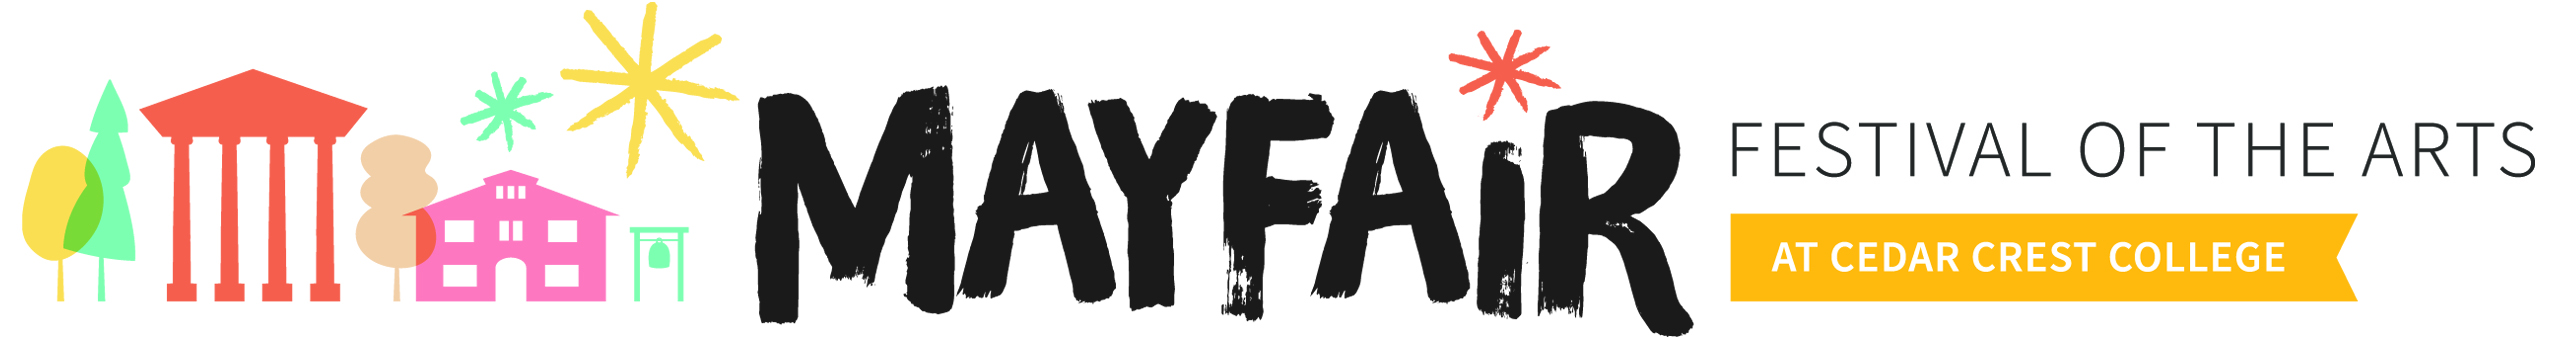 Official Mayfair logo